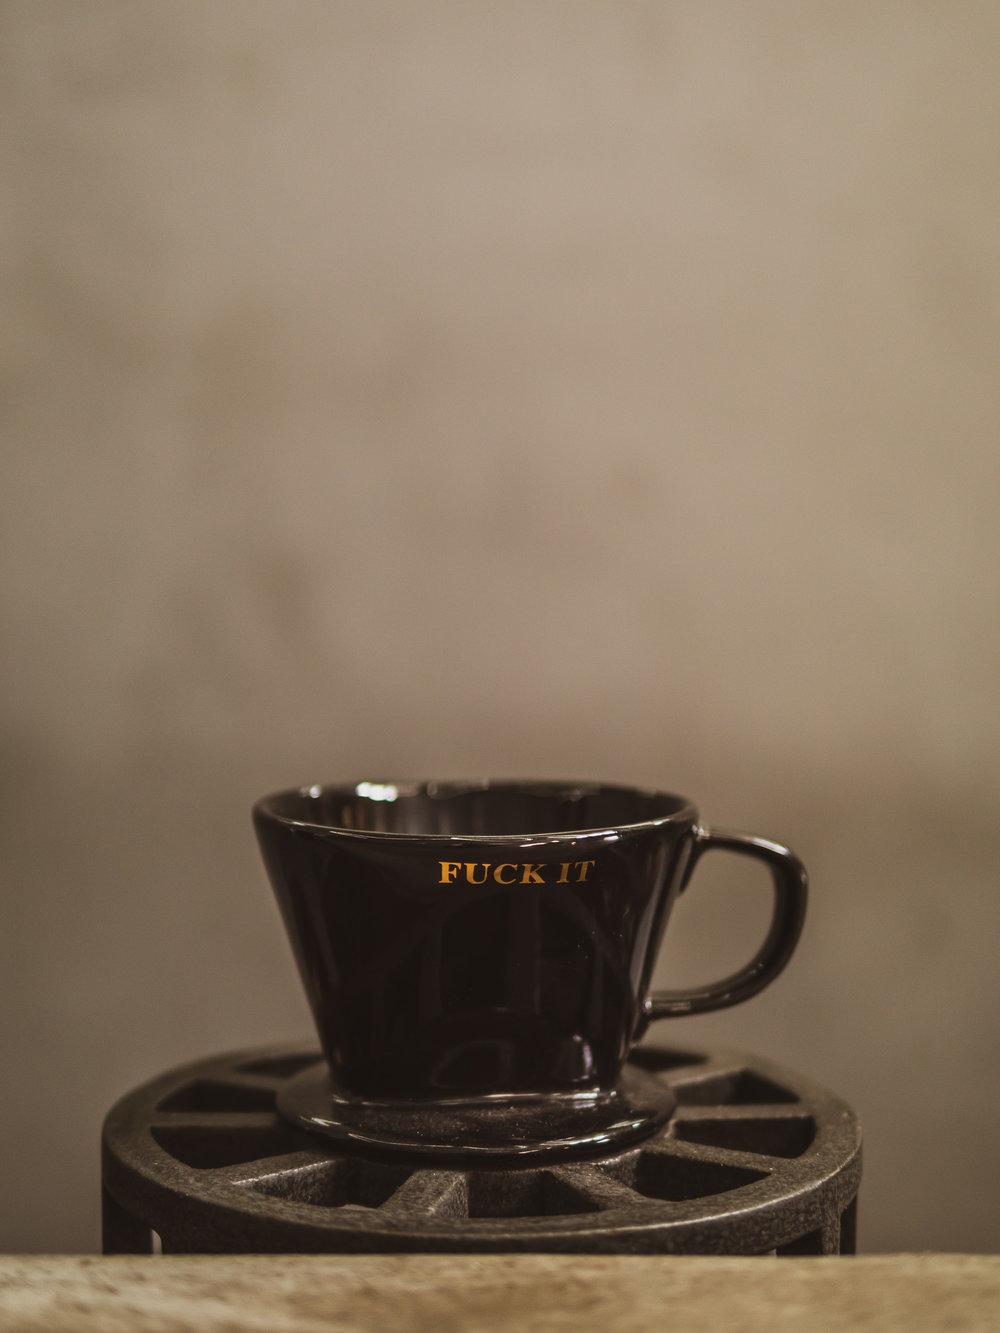 MYBELONGING-GIORGI-PORGI-COFFEE-HOUSE-DOWNTOWN-LA-PHOTOGRAPHY21.jpg